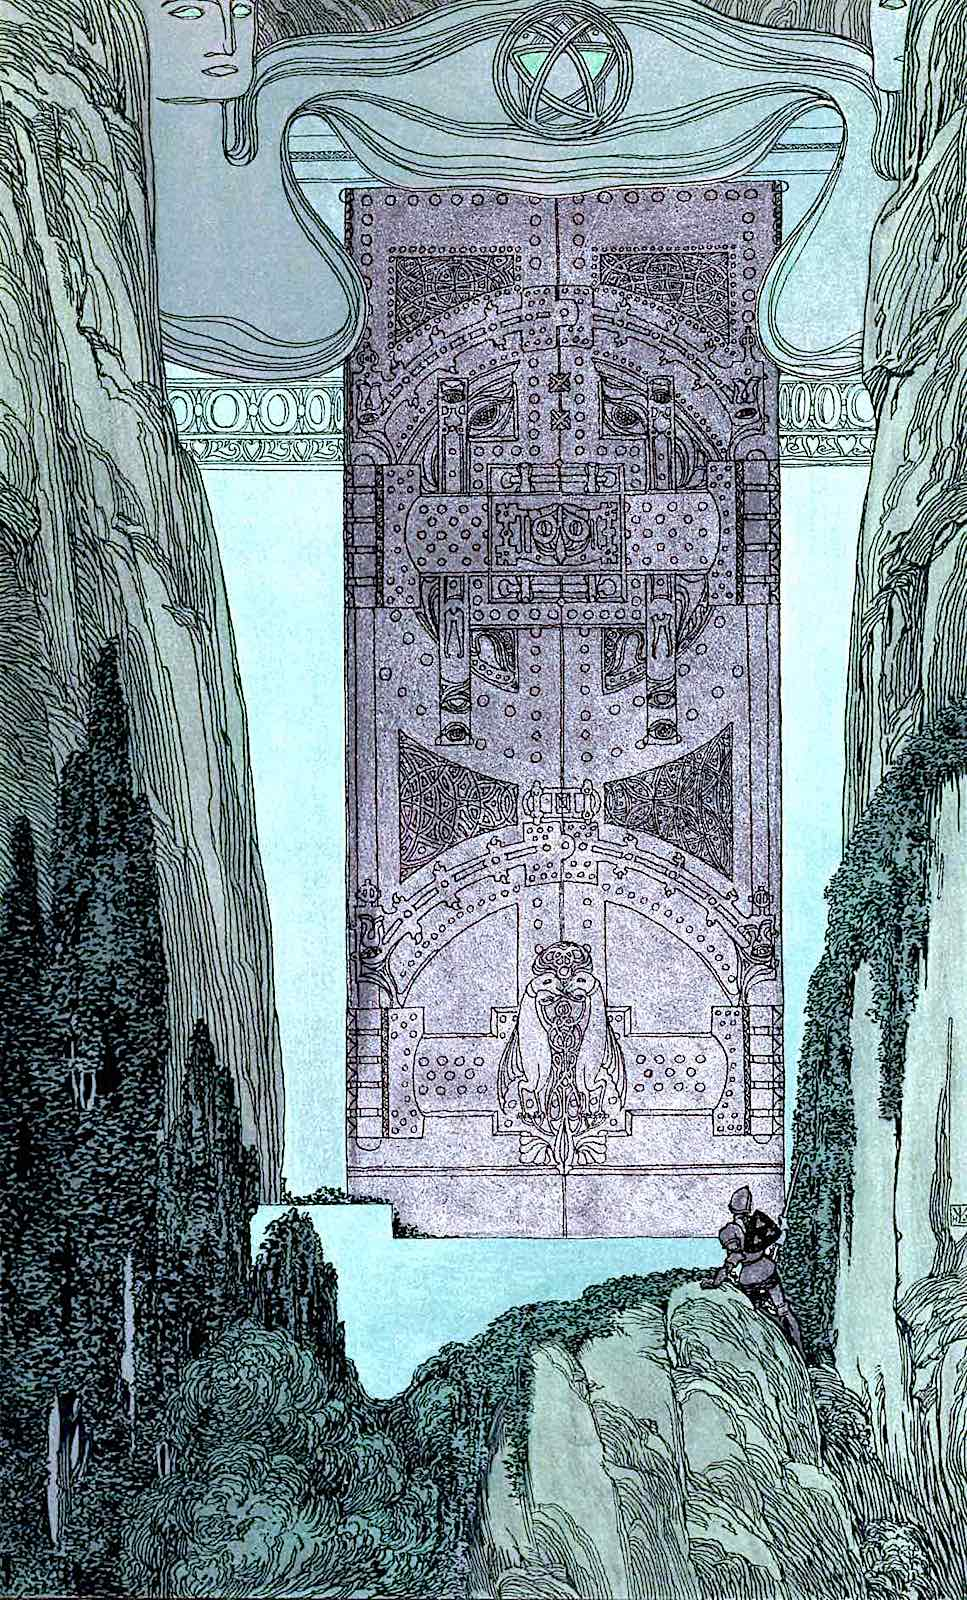 a Heinrich Lefler illustration of an adventurer looking at enormous doors